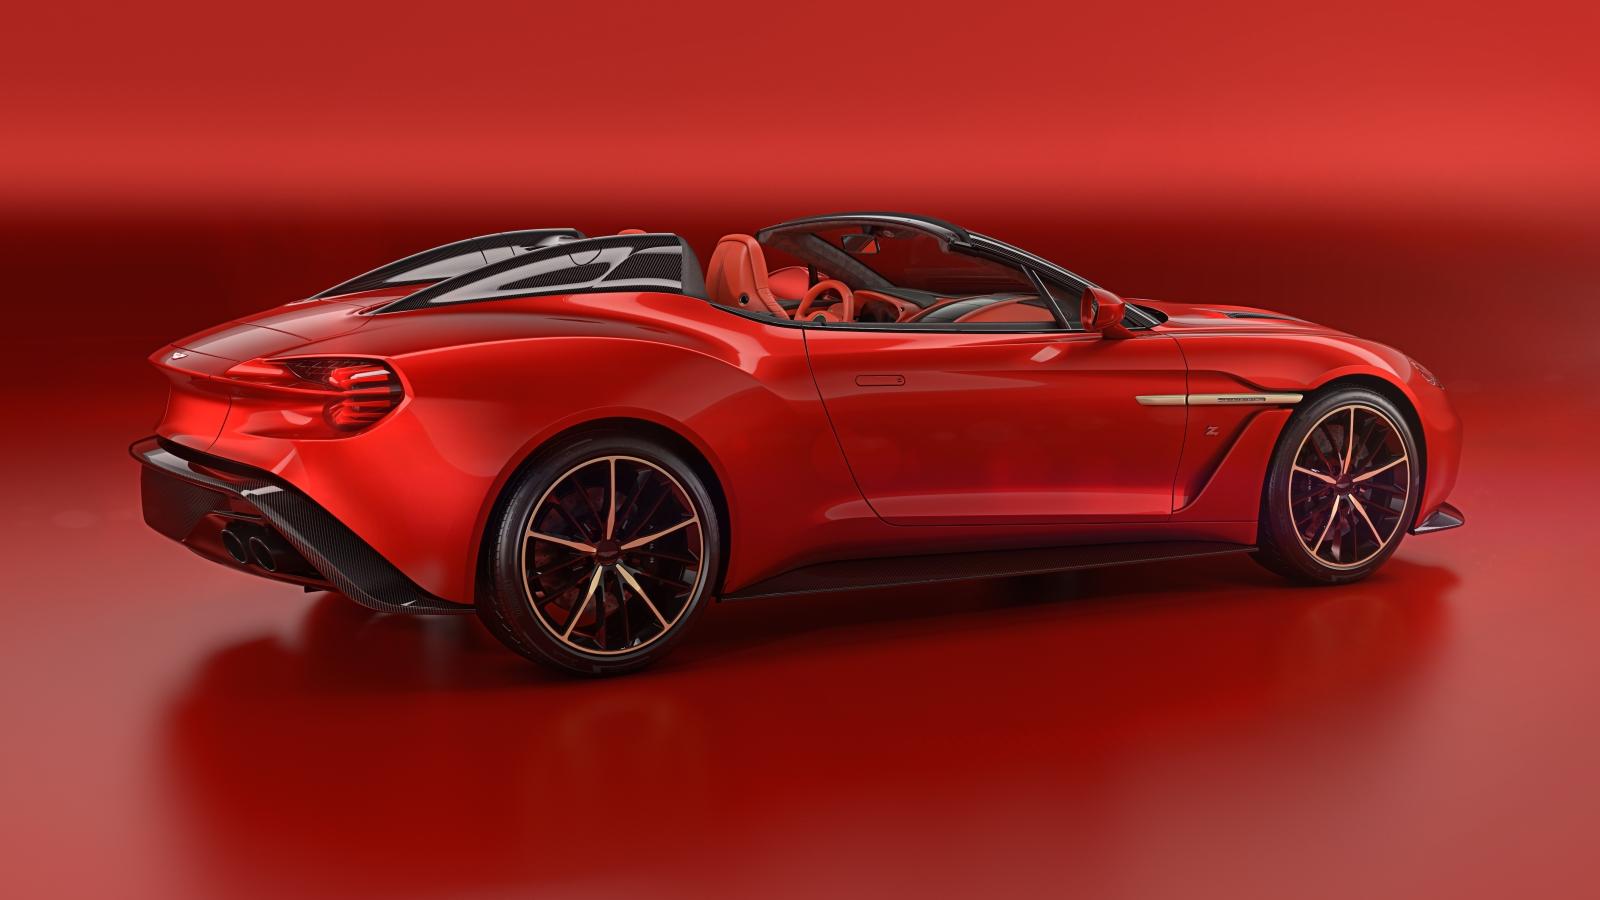 Az Aston Martin Vanquish Zagato család